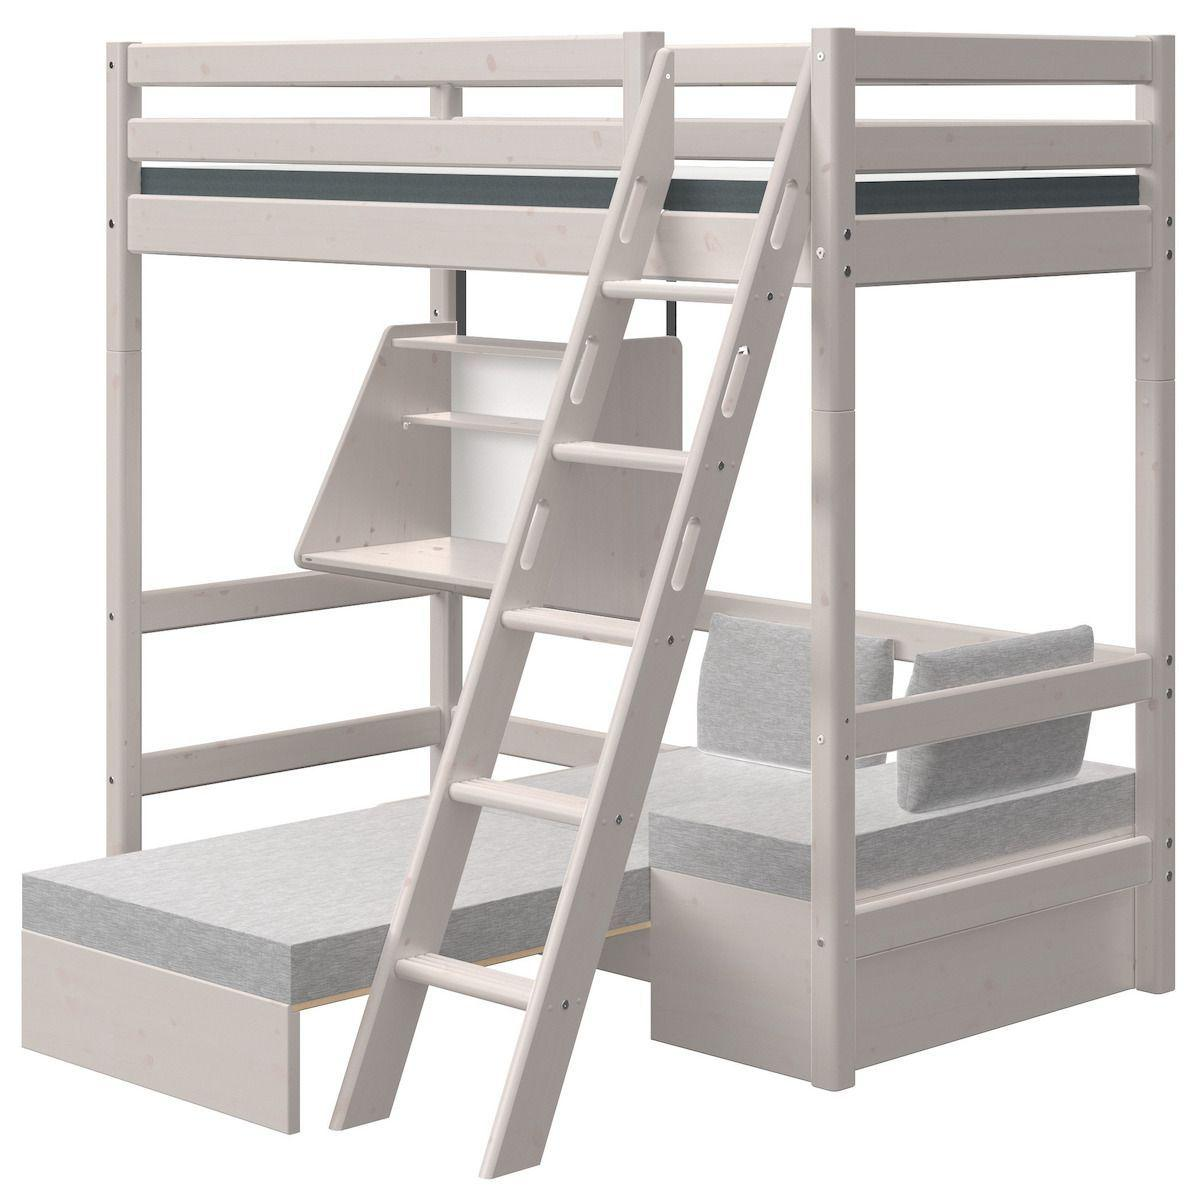 Cama alta 90x190cm escalera inclinada-módulo casa-escritorio clic CLASSIC Flexa grey washed